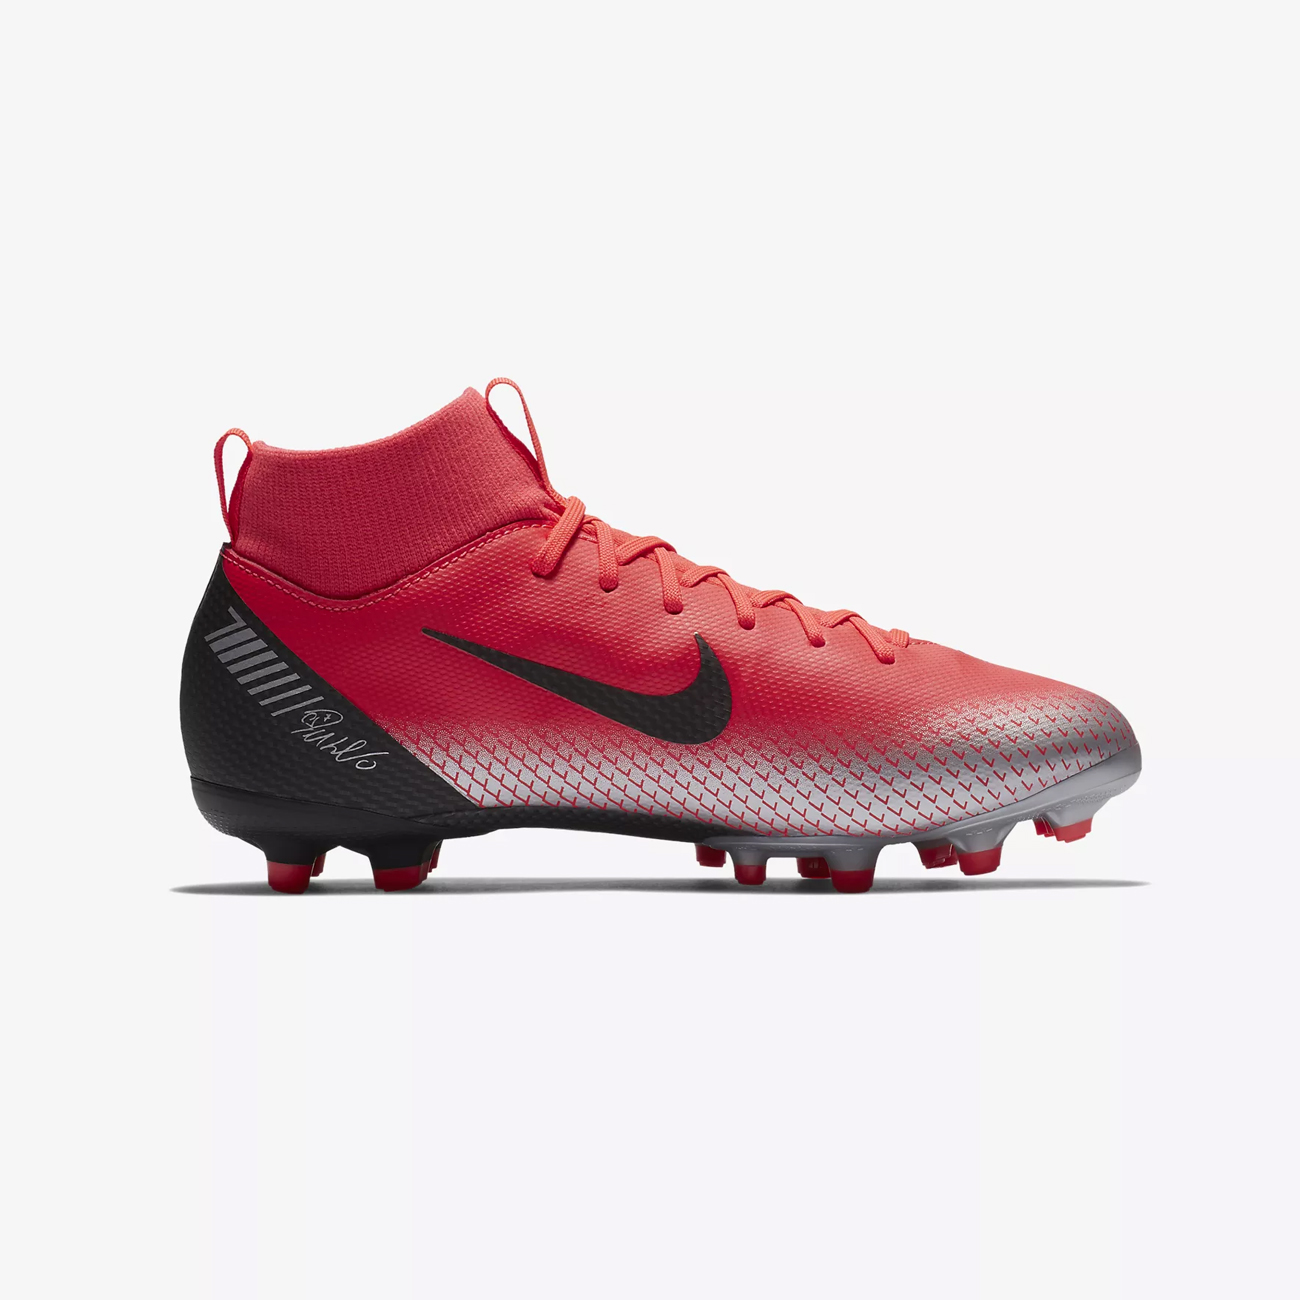 more photos 7d854 1a673 Nike Junior Mercurial Superfly 6 CR7 Multi-Ground Football Boot Bright  Crimson